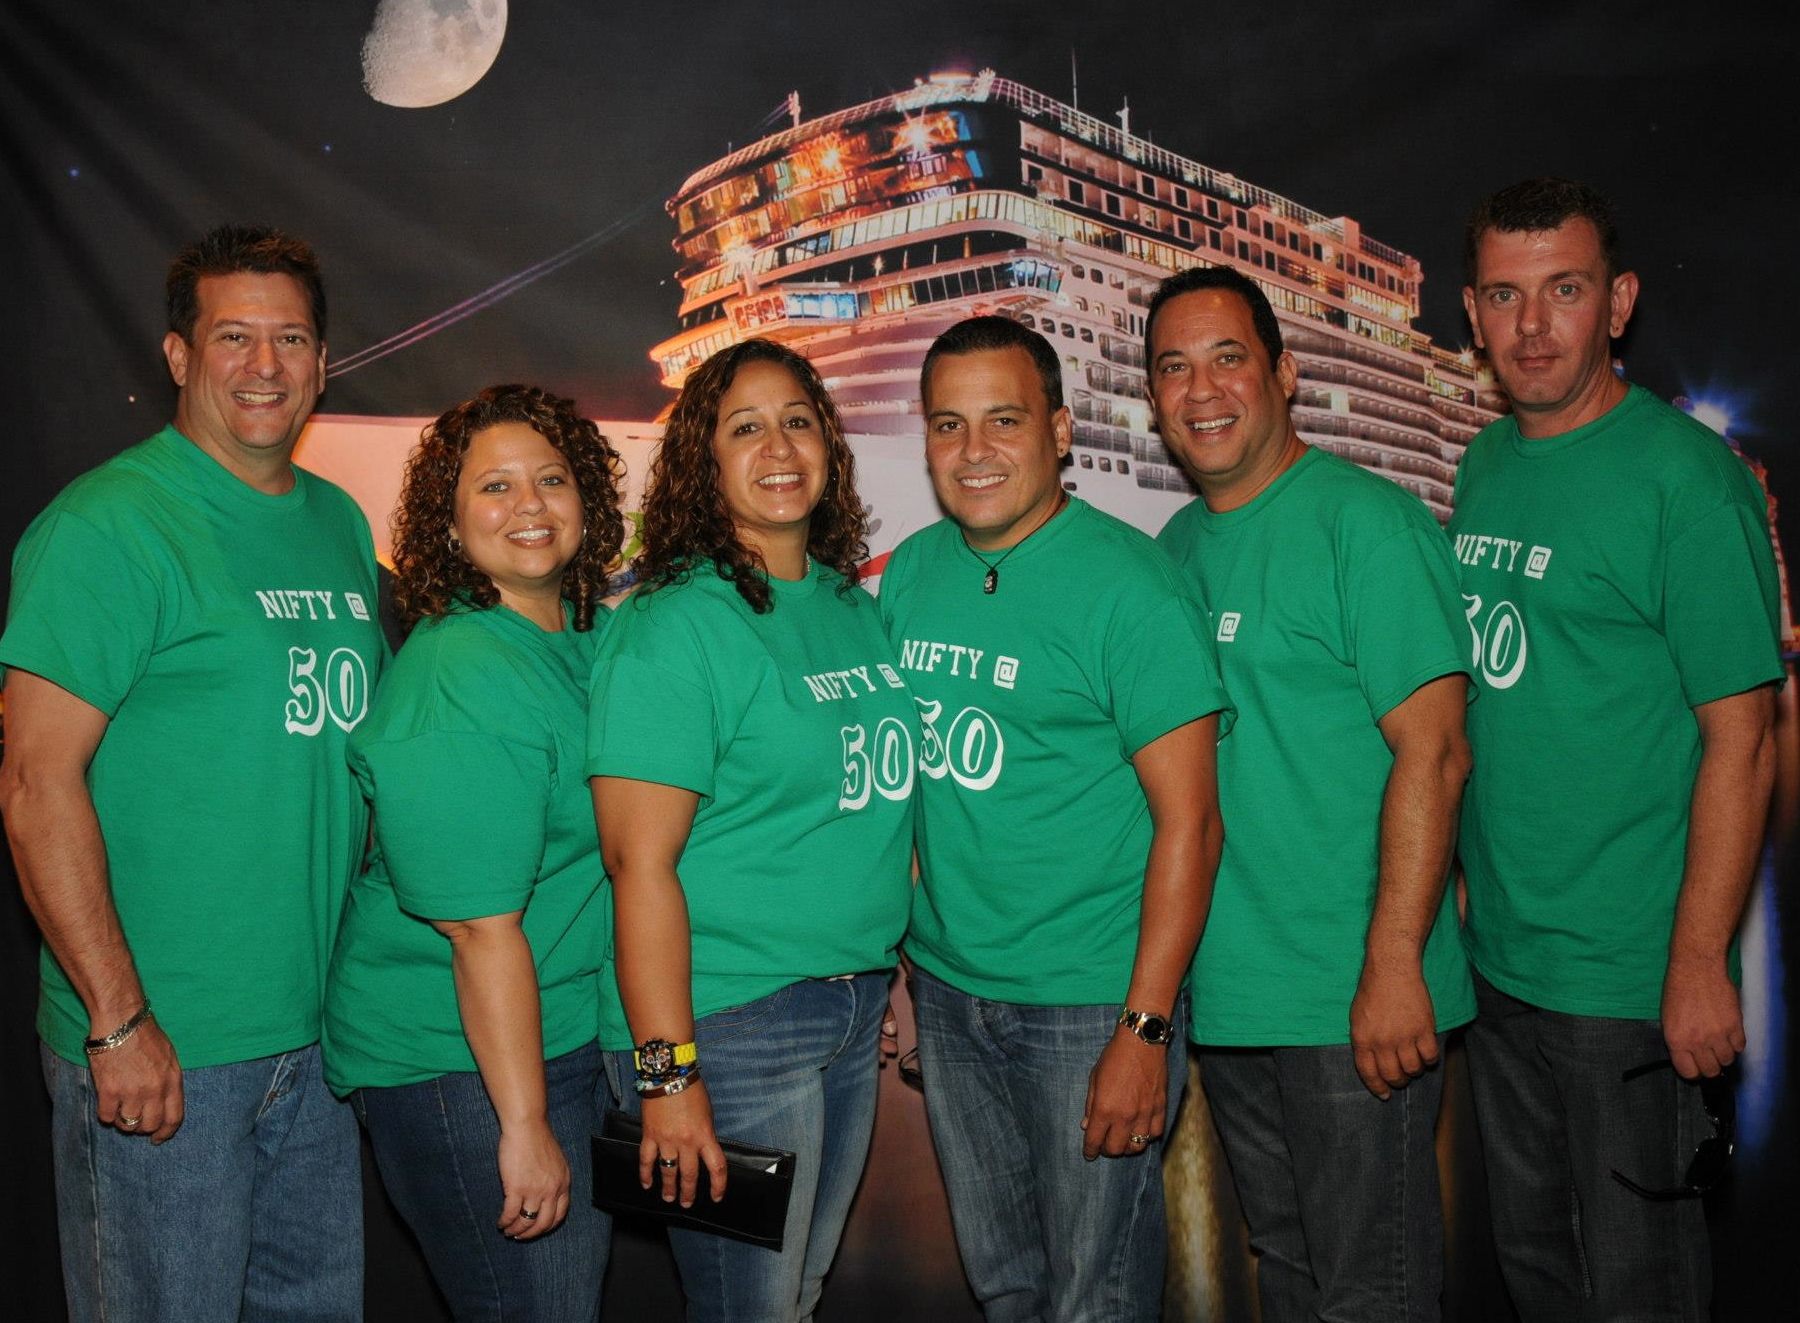 Design t shirt for group - Joe S Bday Cruise T Shirt Photo